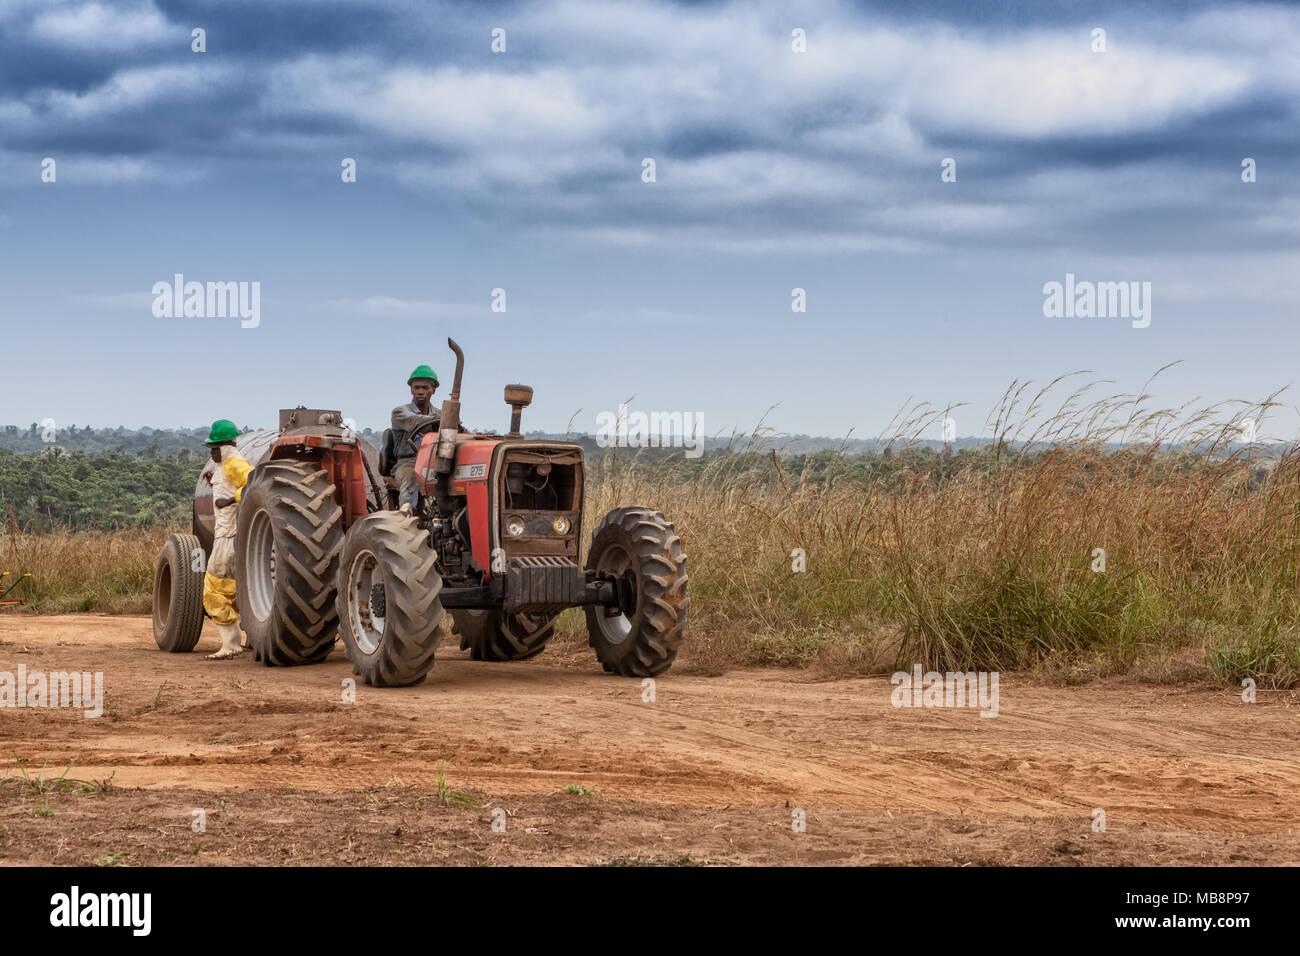 CABINDA/ANGOLA - 09JUN2010 - African farmer on tractor to cross plantation of tomatoes. - Stock Image